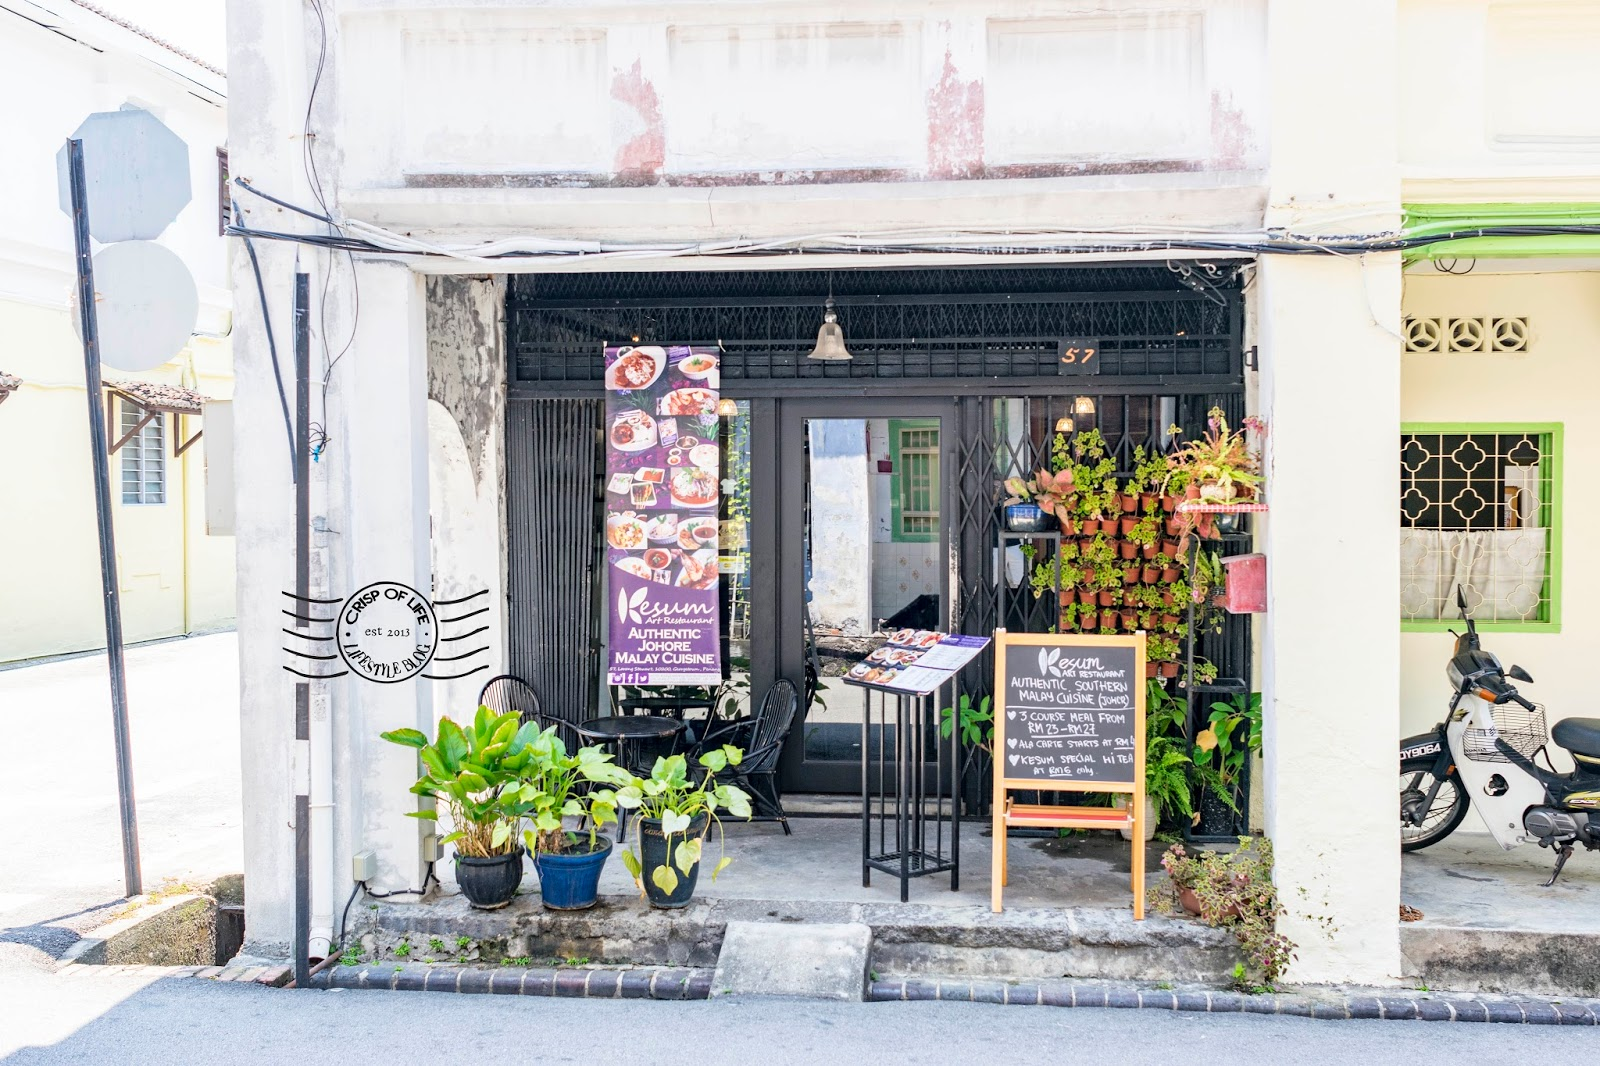 Johor Cuisine Penang Kesum Art Restaurant Stewart Lane